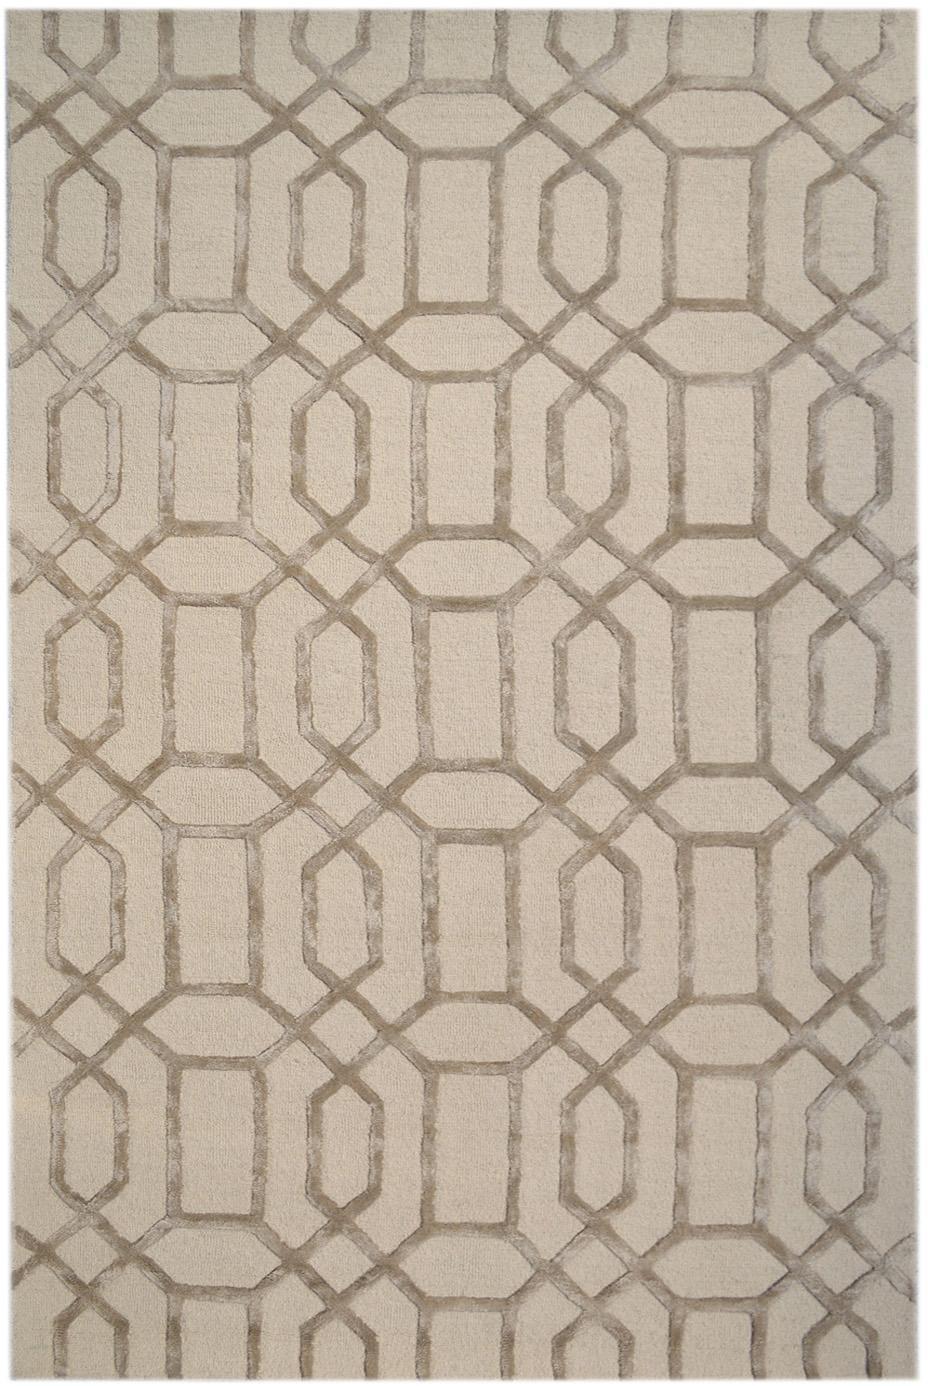 Alfombra artesanal de lana Vegas, Parte superior: 80%lana, 20%viscosa, Reverso: algodón, Beige, crema, An 120 x L 185 cm (Tamaño S)